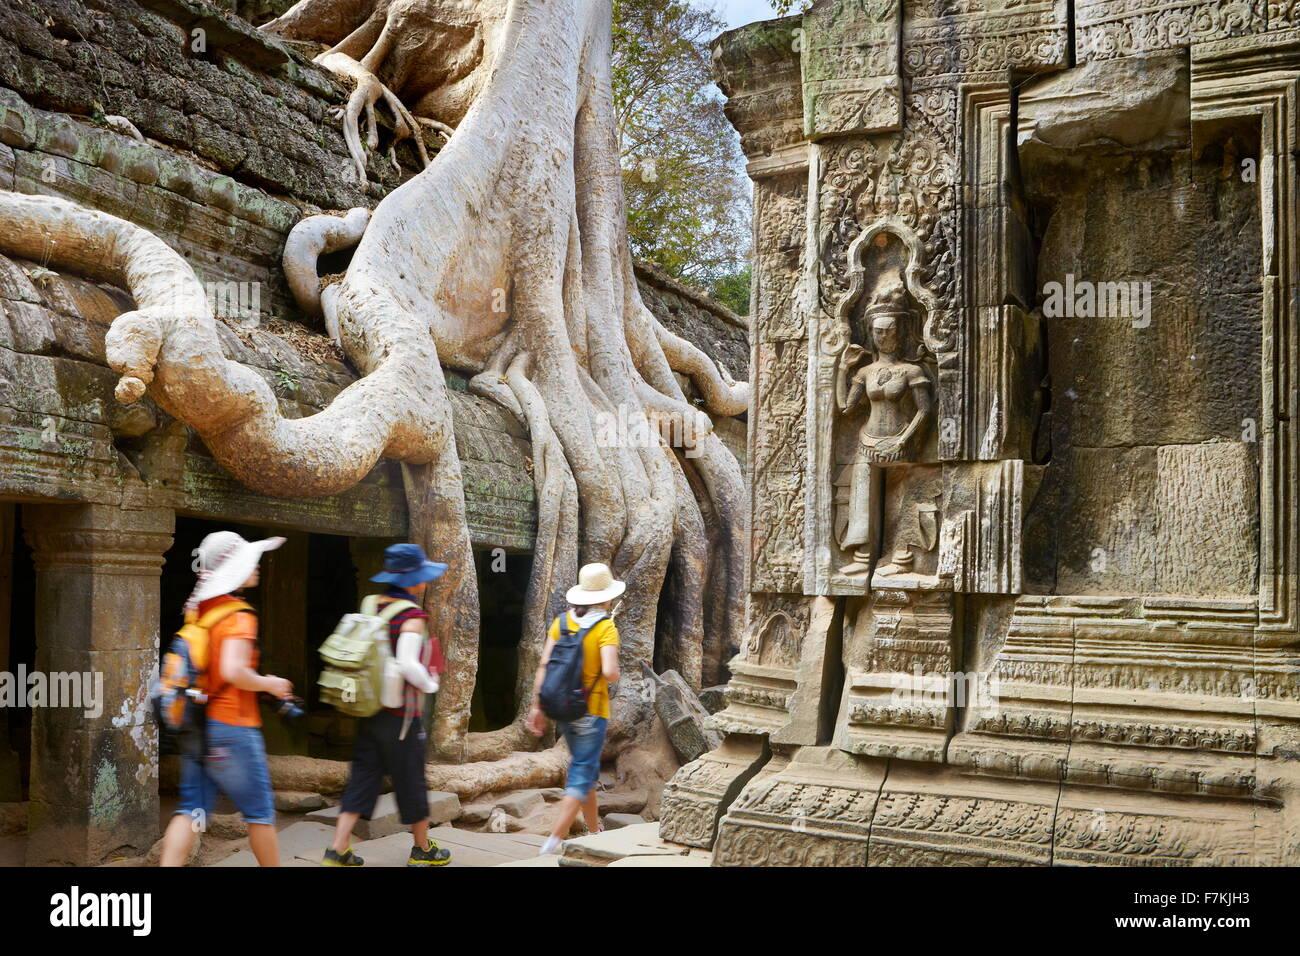 Ta Prohm Temple near Angkor Wat, Angkor, Siem Reap, Cambodia, Asia - Stock Image